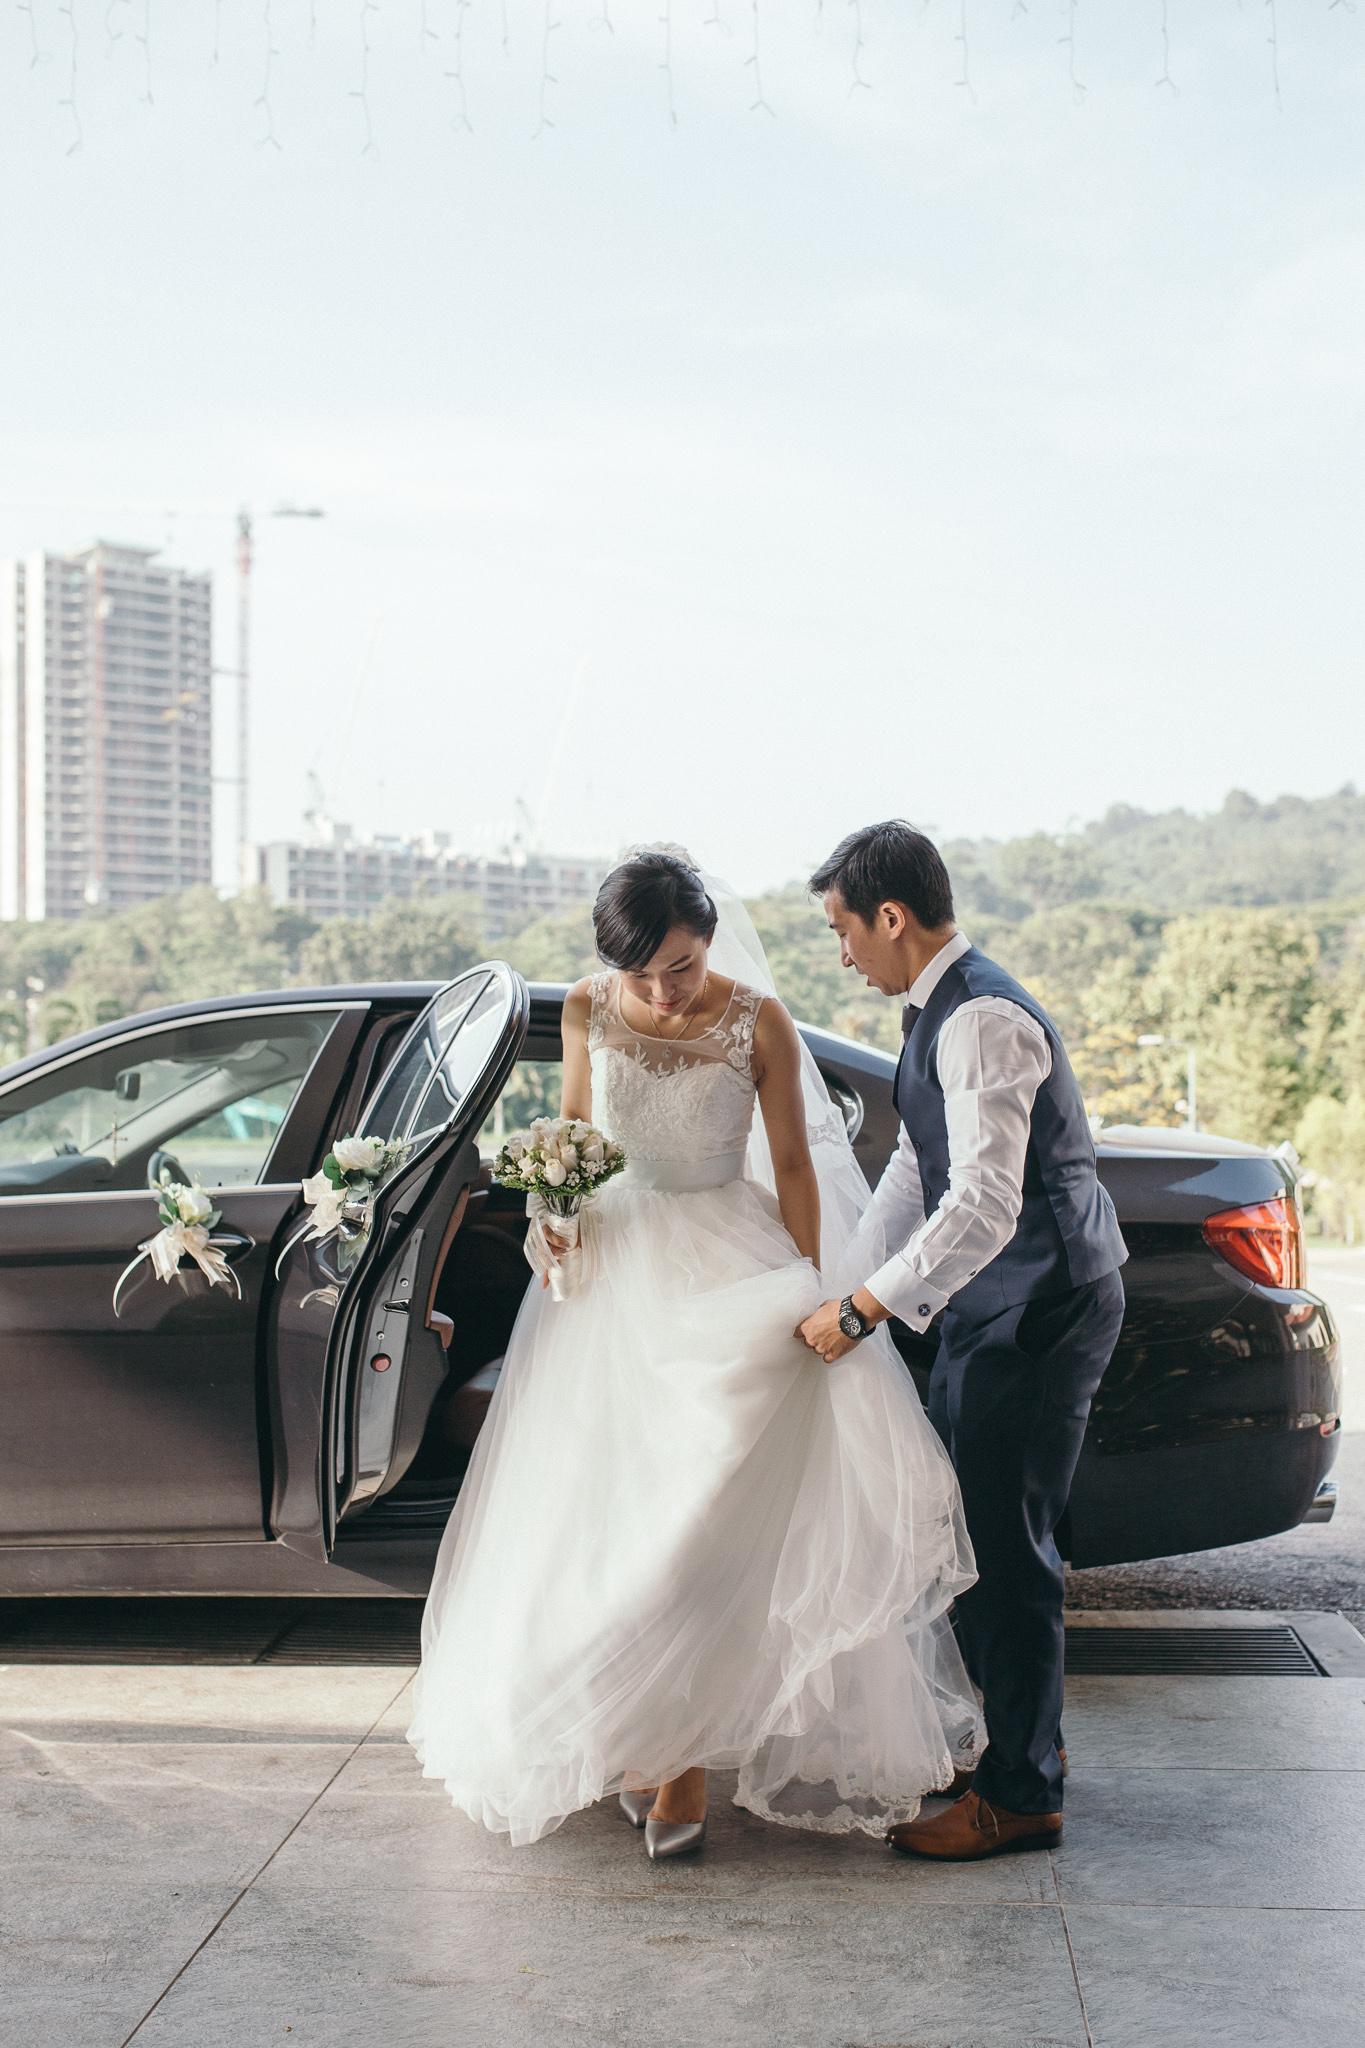 Juxtapose Pix - Wedding - Kelvin & Serene - church regent hotel 00017.jpg